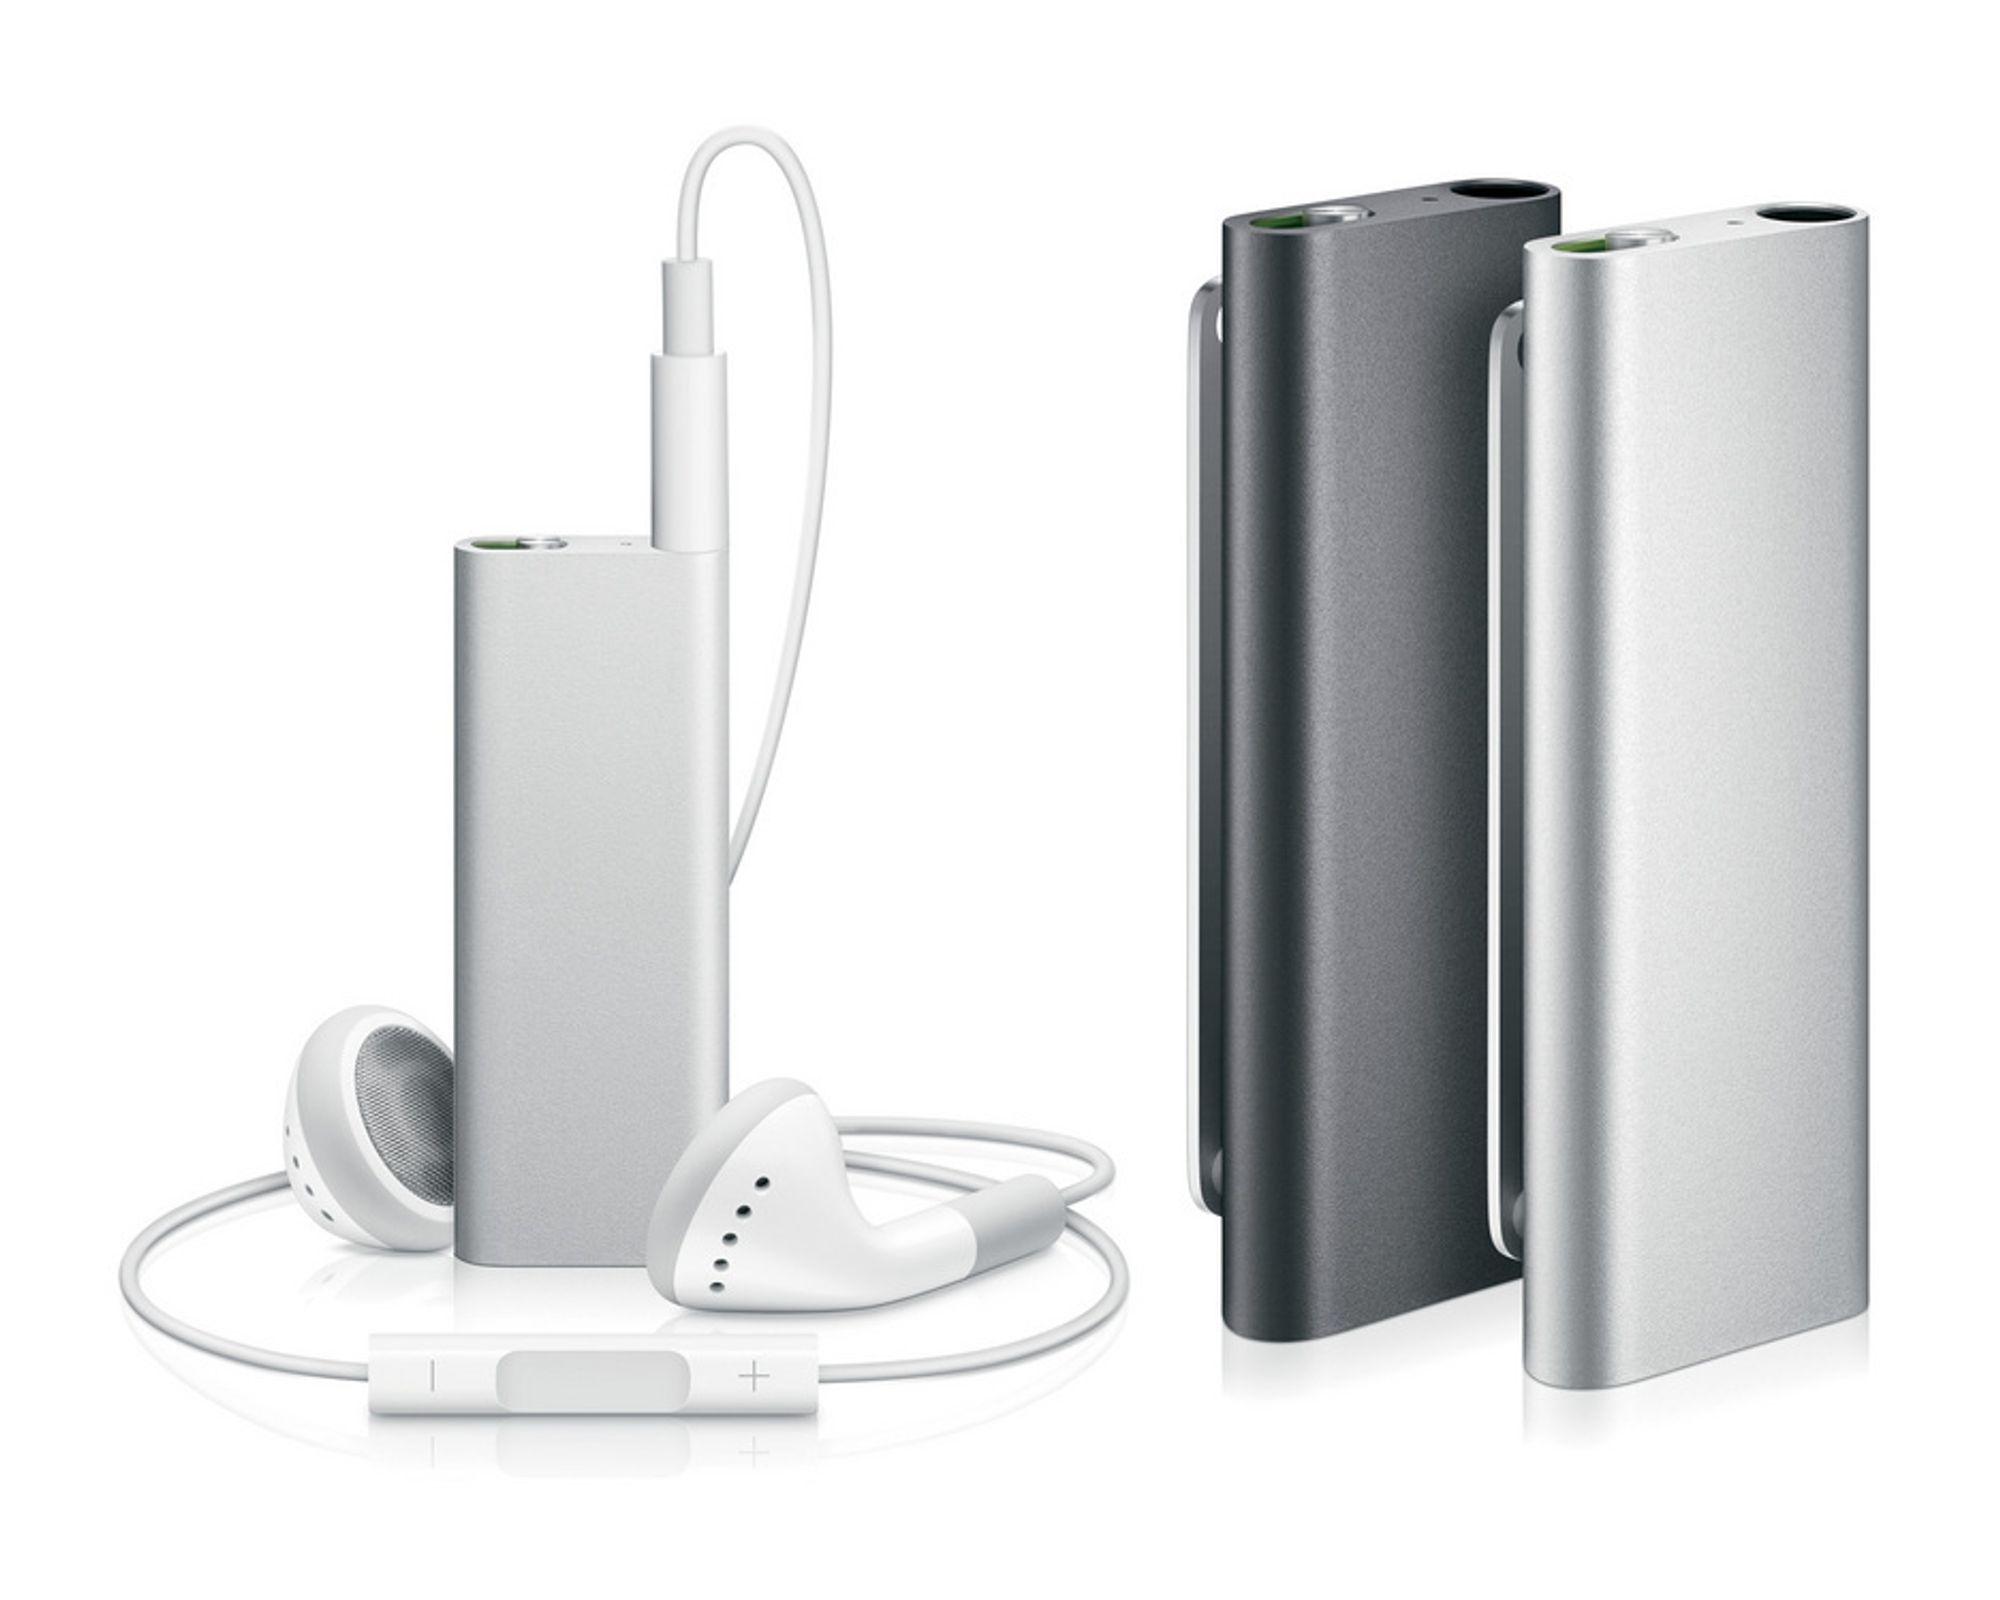 Nye iPod Shuffle veier like over 10 gram.